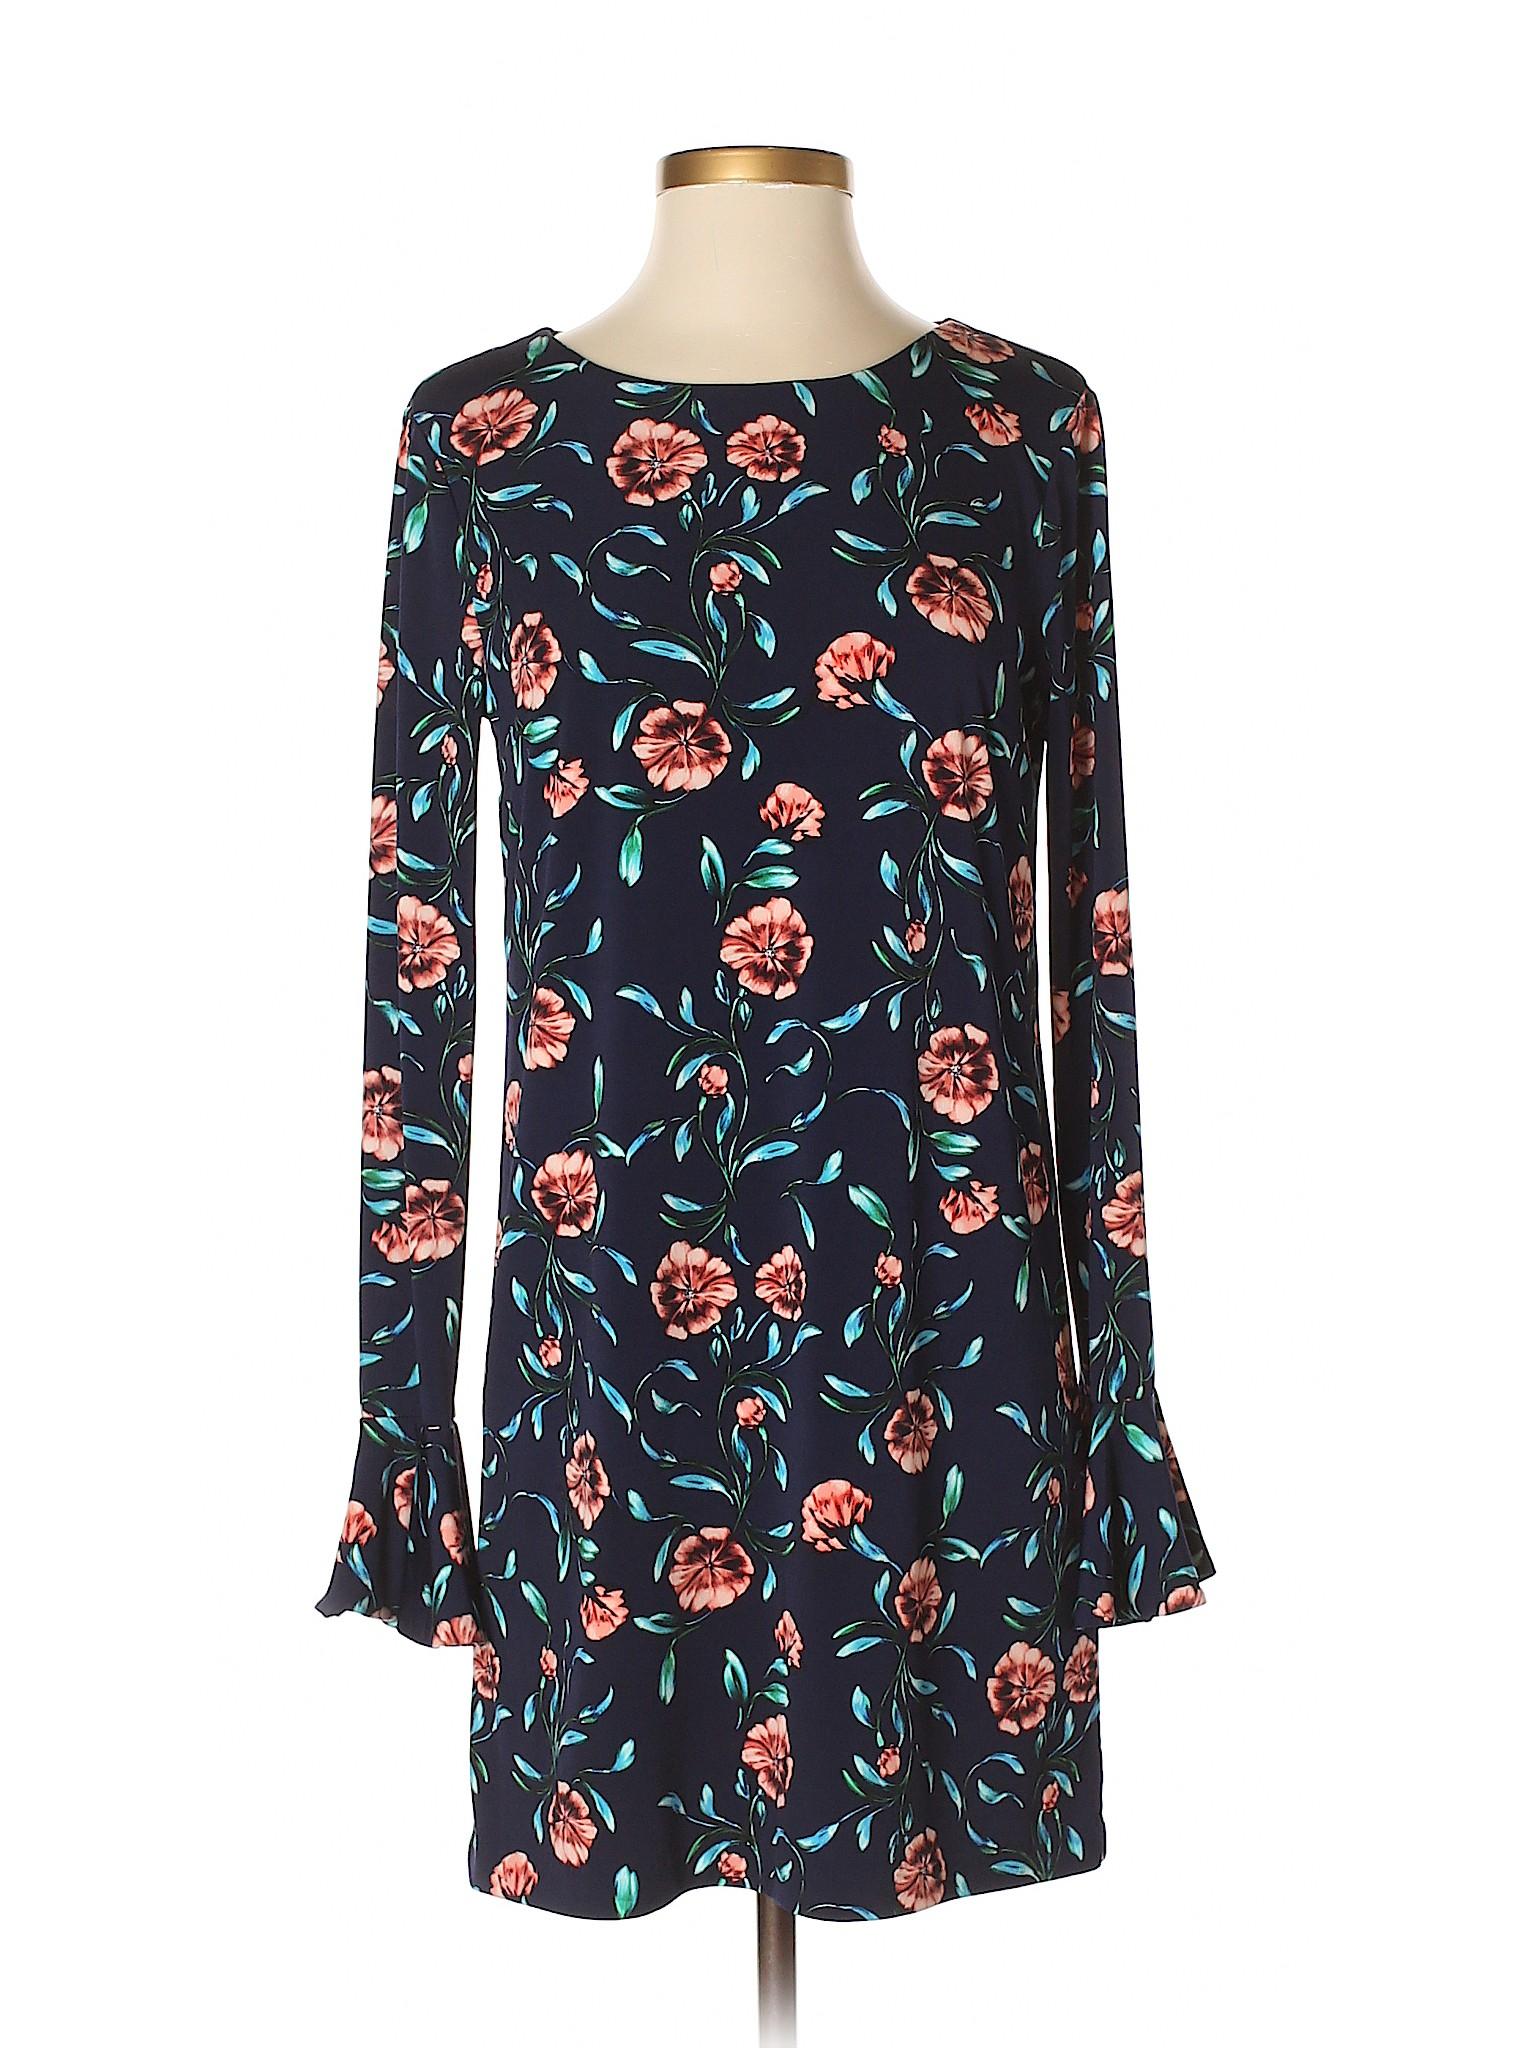 Casual Winter Steffe Cynthia Boutique Dress qaPAx1nw